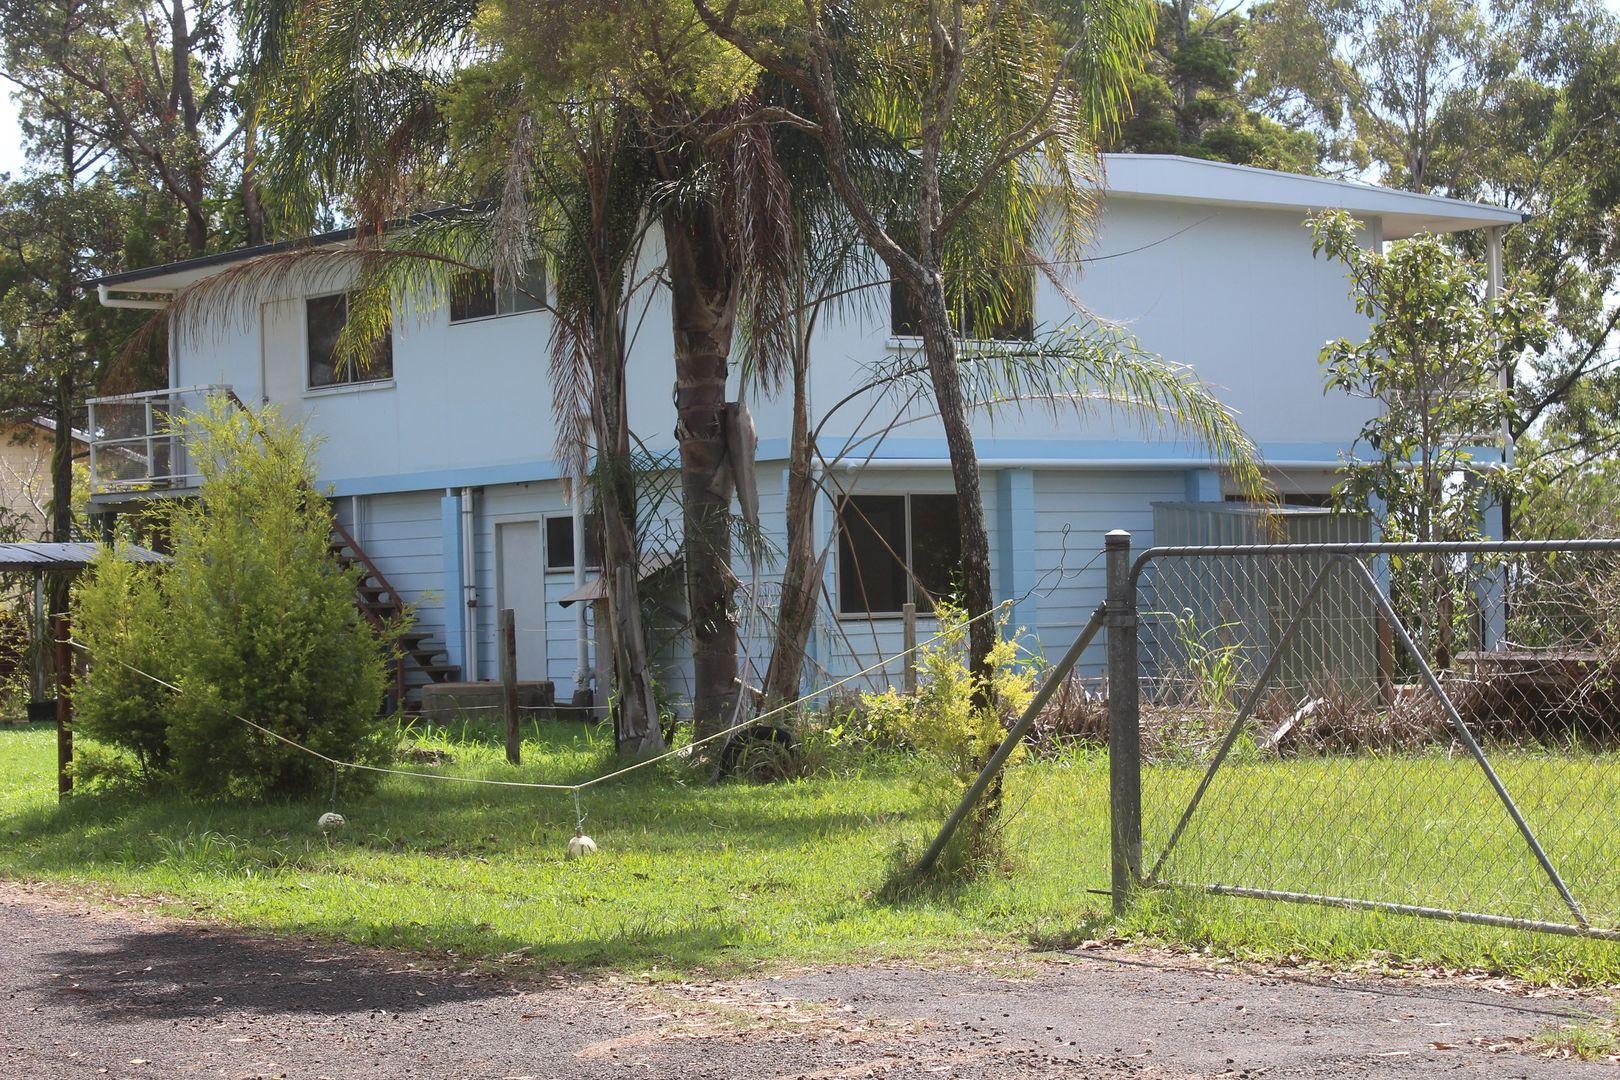 21-25 KEATS STREET, Russell Island QLD 4184, Image 1